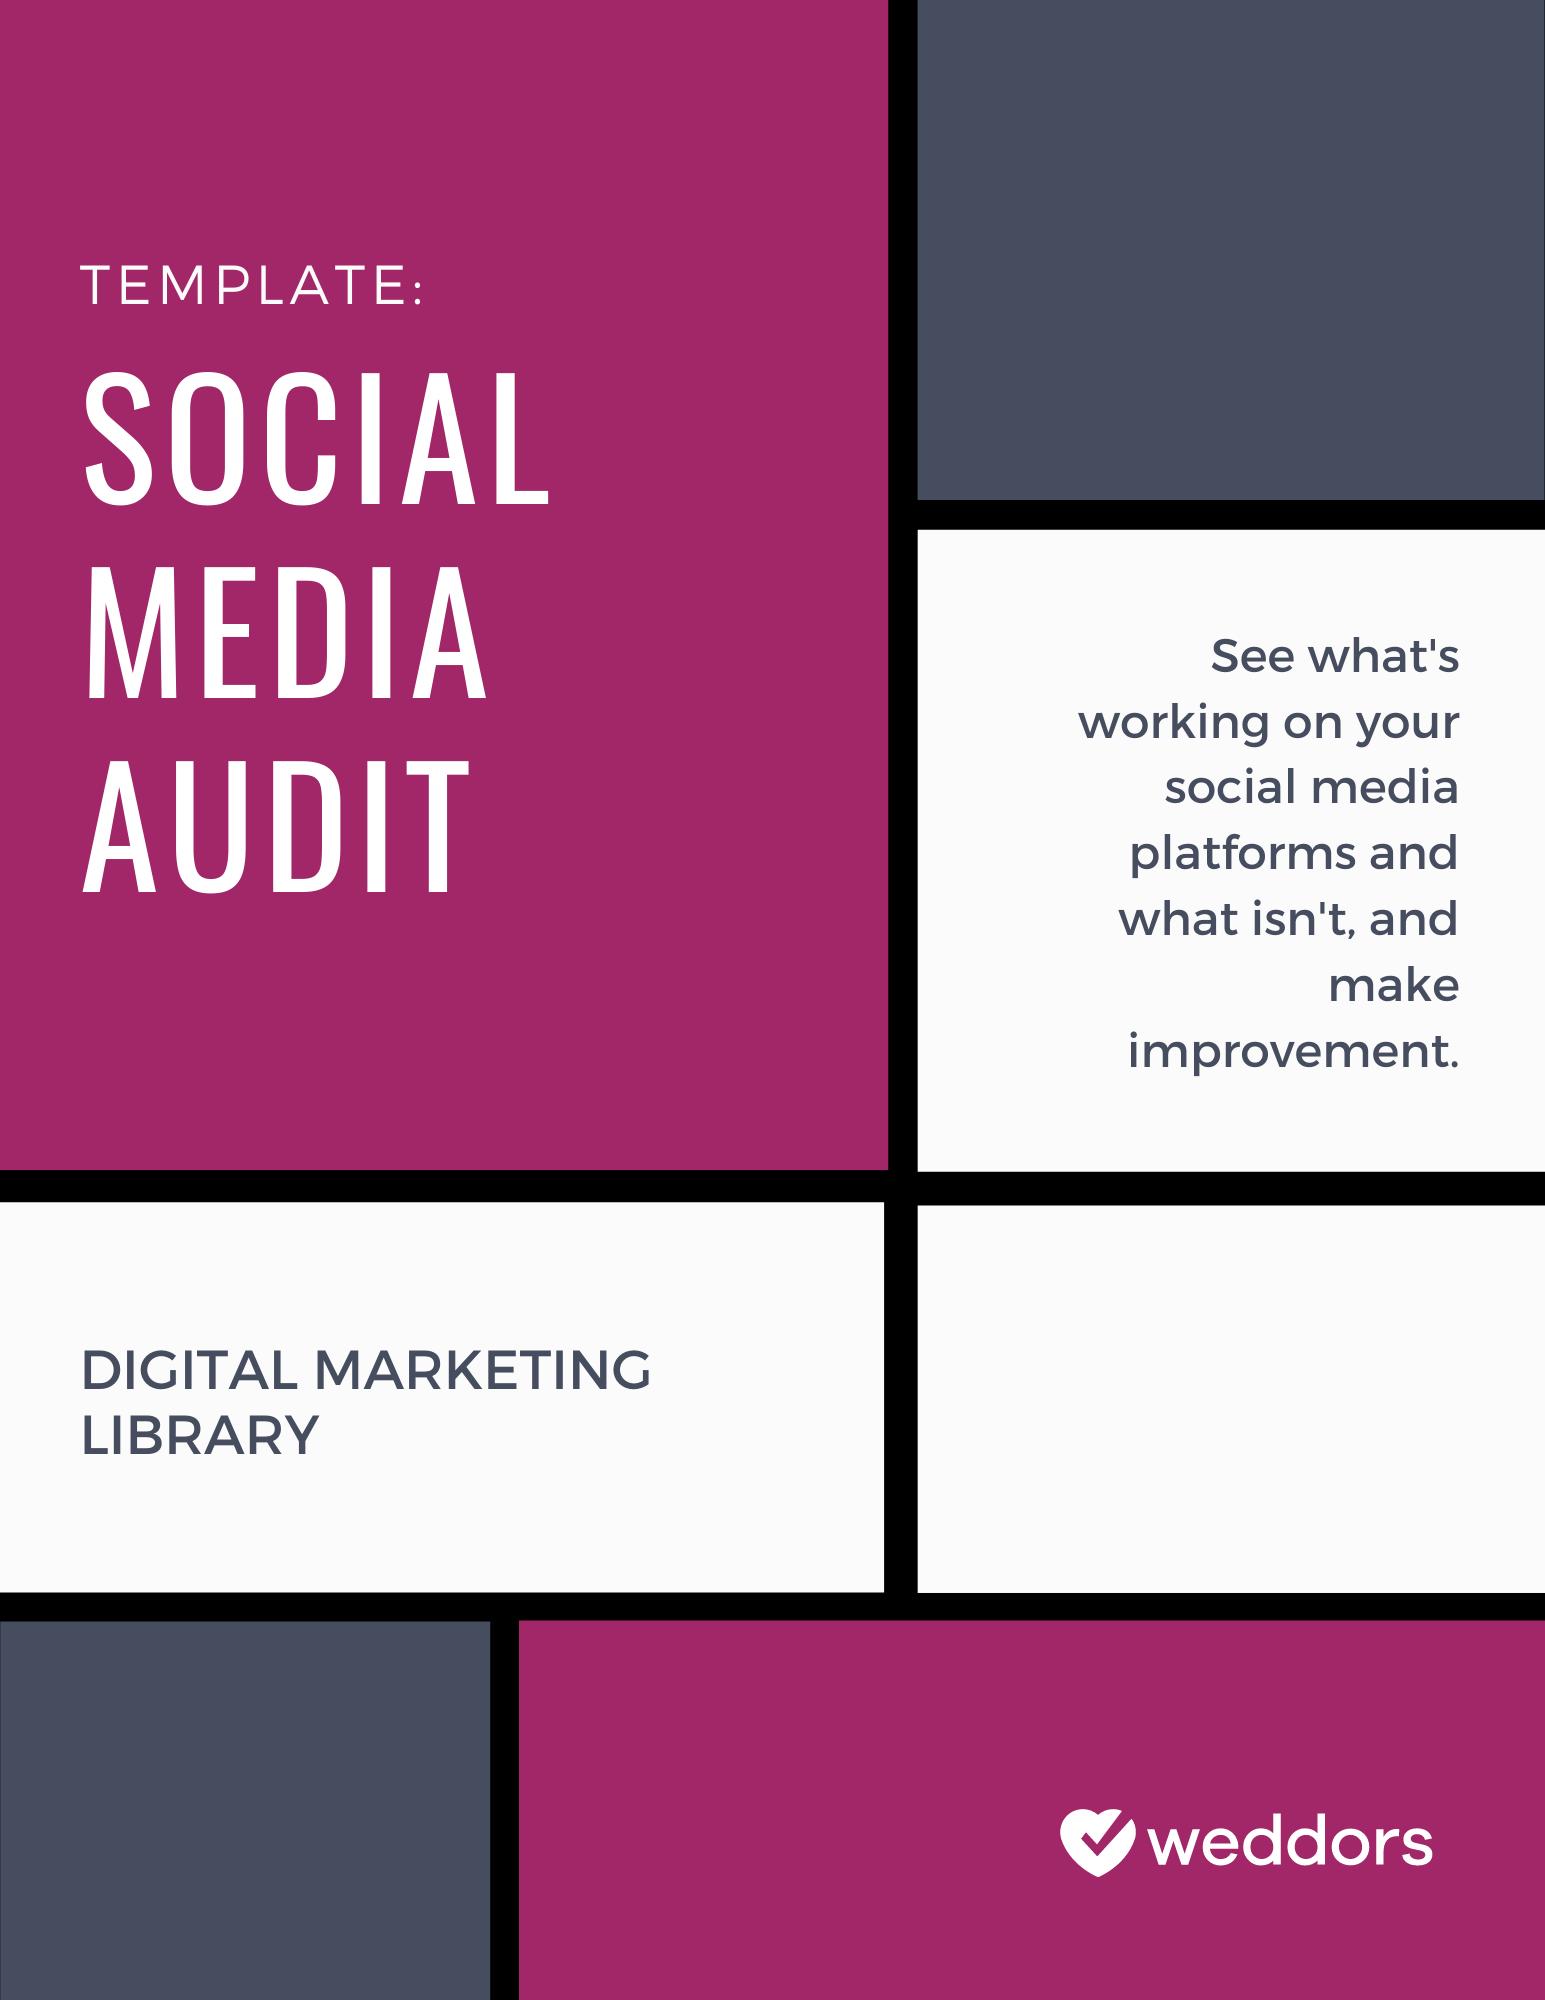 Social Media Audit Template